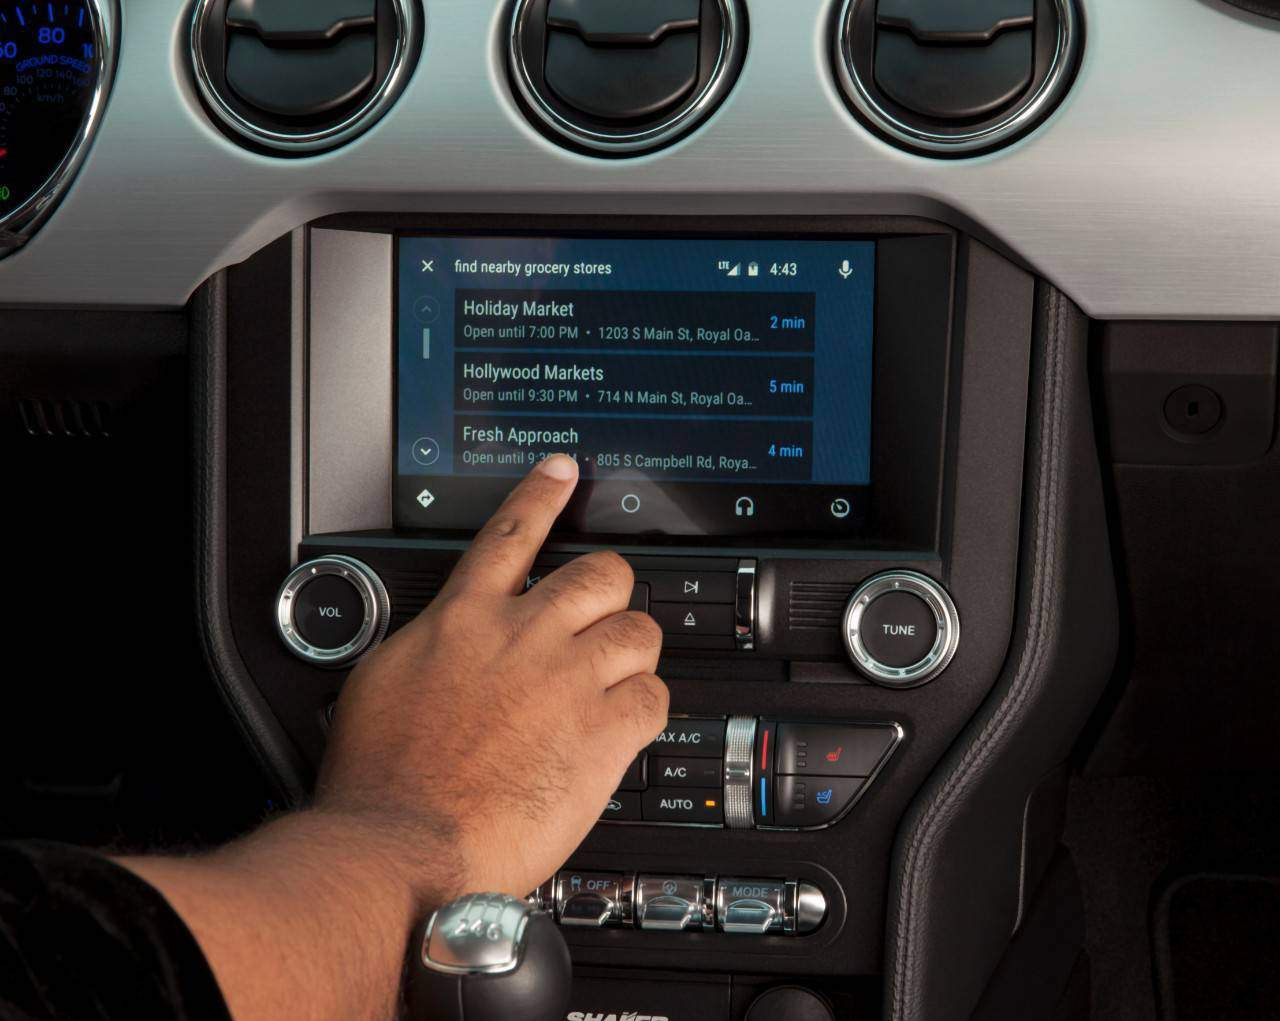 AndroidAuto 8133 HR